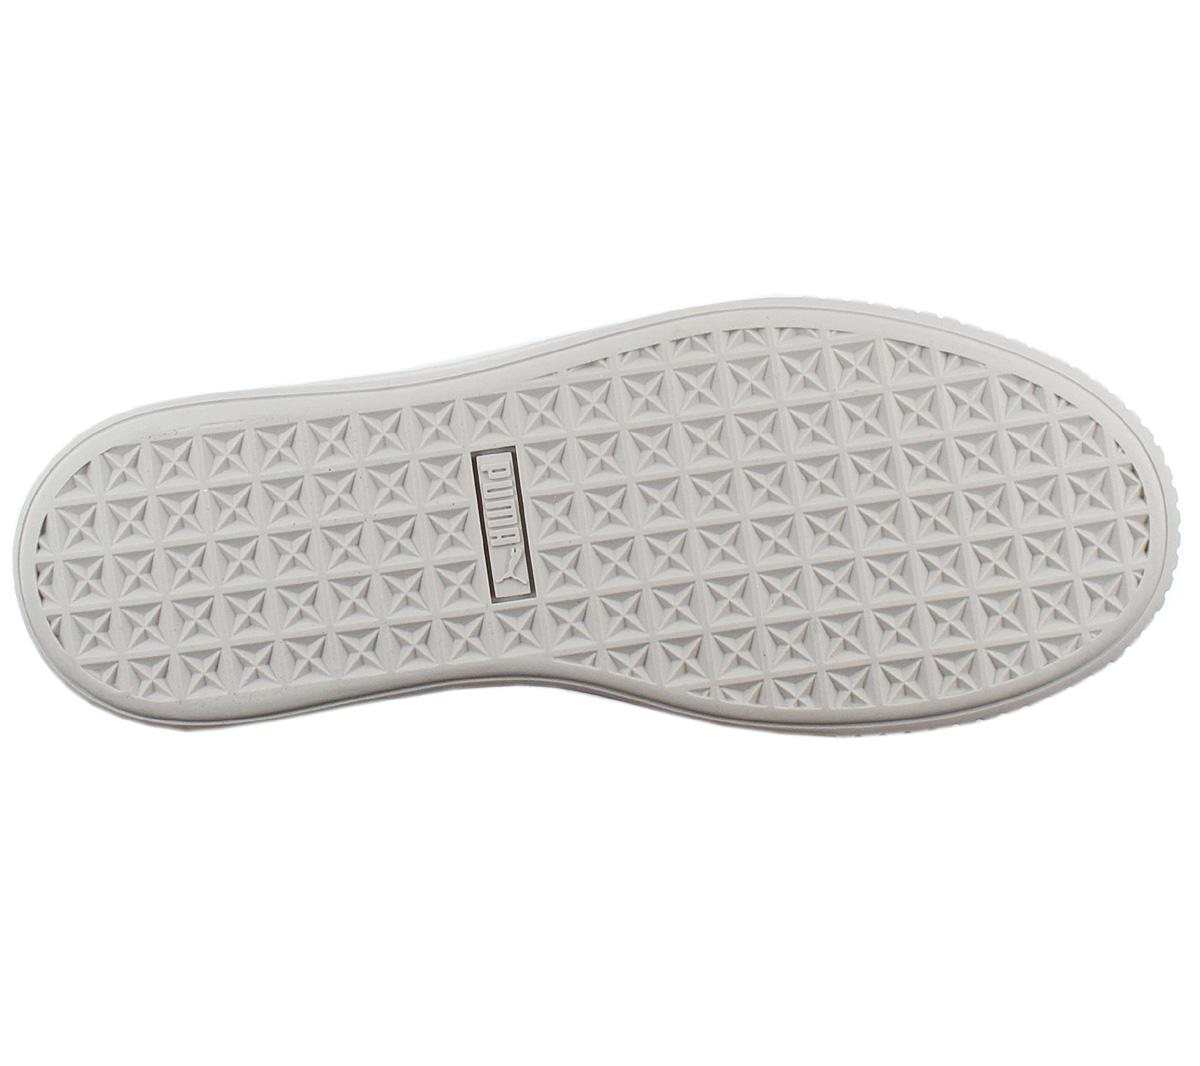 Puma Platform Basket Bling Sneaker Damen Plateau Schuhe 367237-02 Grau NEU